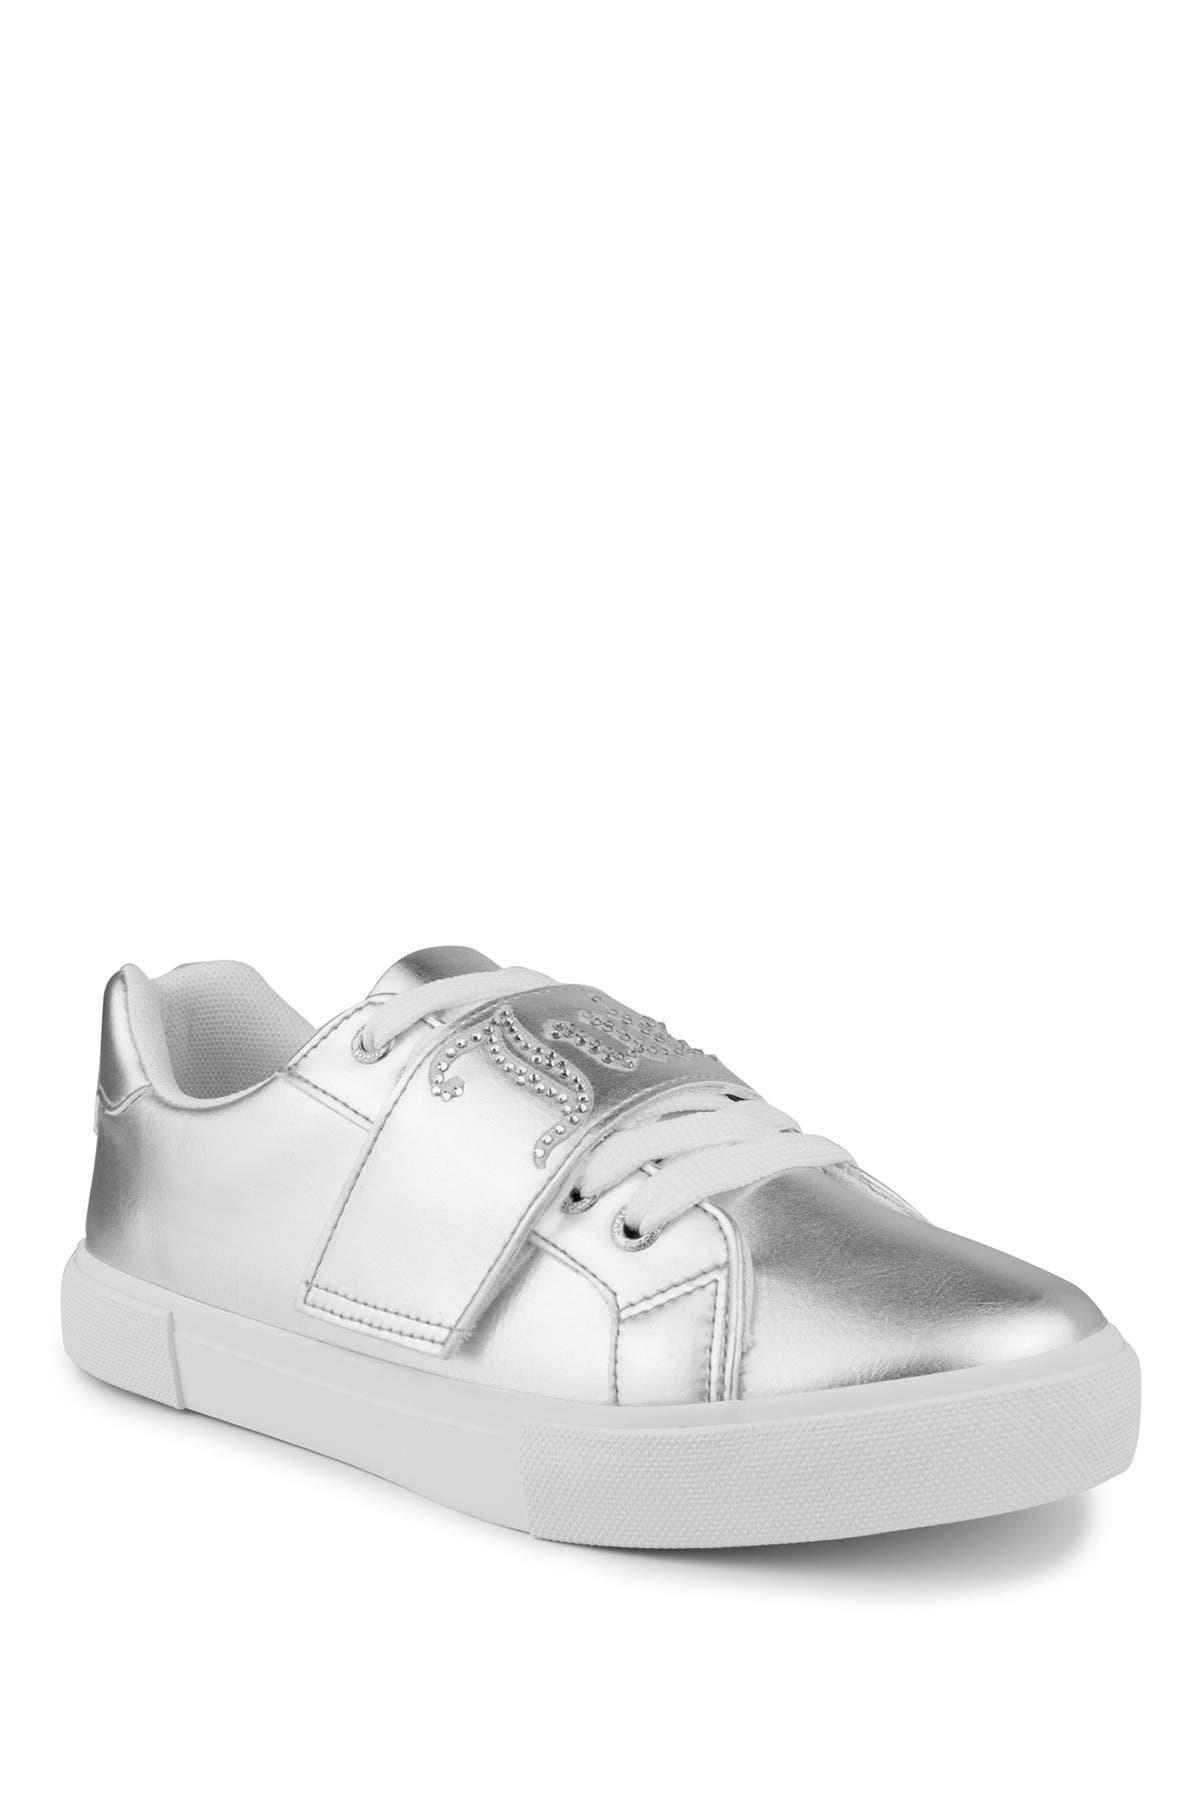 Image of Juicy Couture Cartwheel Fashion Sneaker